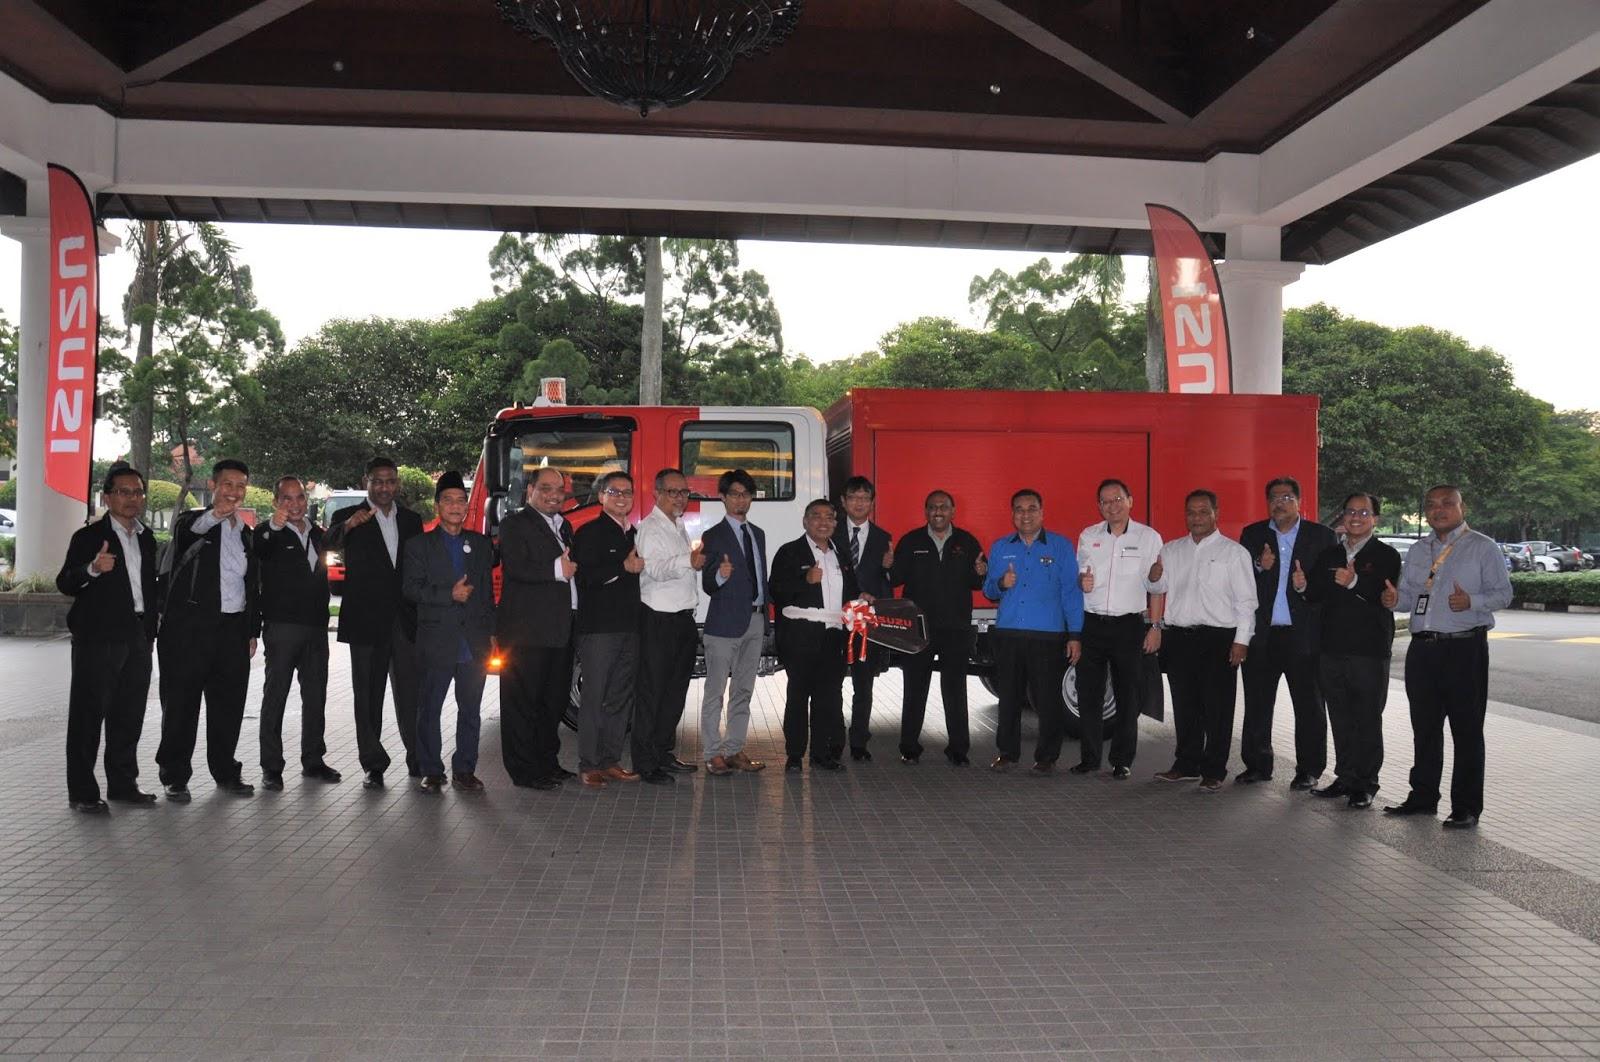 Motoring-Malaysia: Trucks - Isuzu Malaysia Delivers 61 New